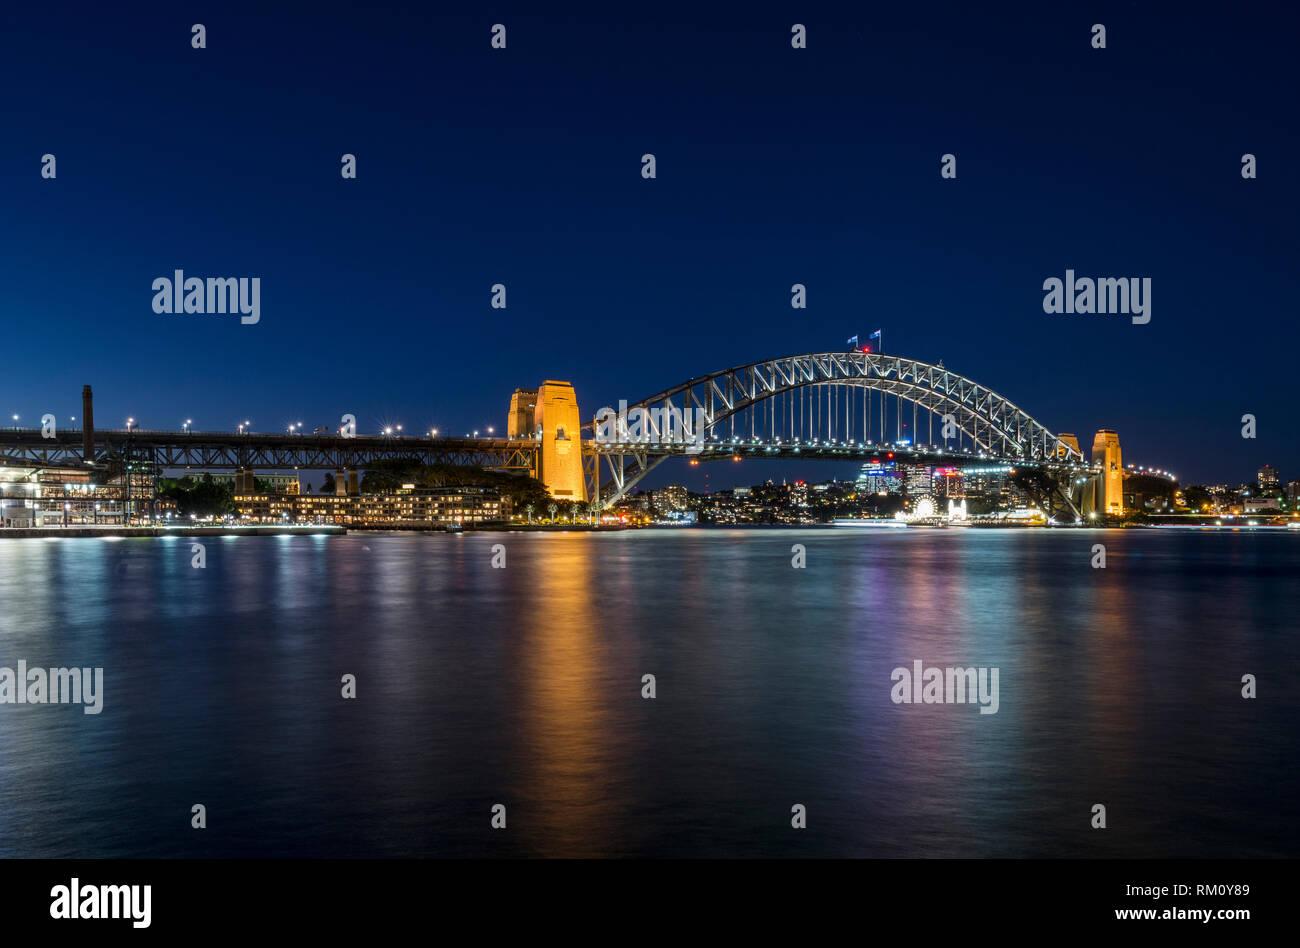 Sydney Harbour Bridge by night. Stock Photo